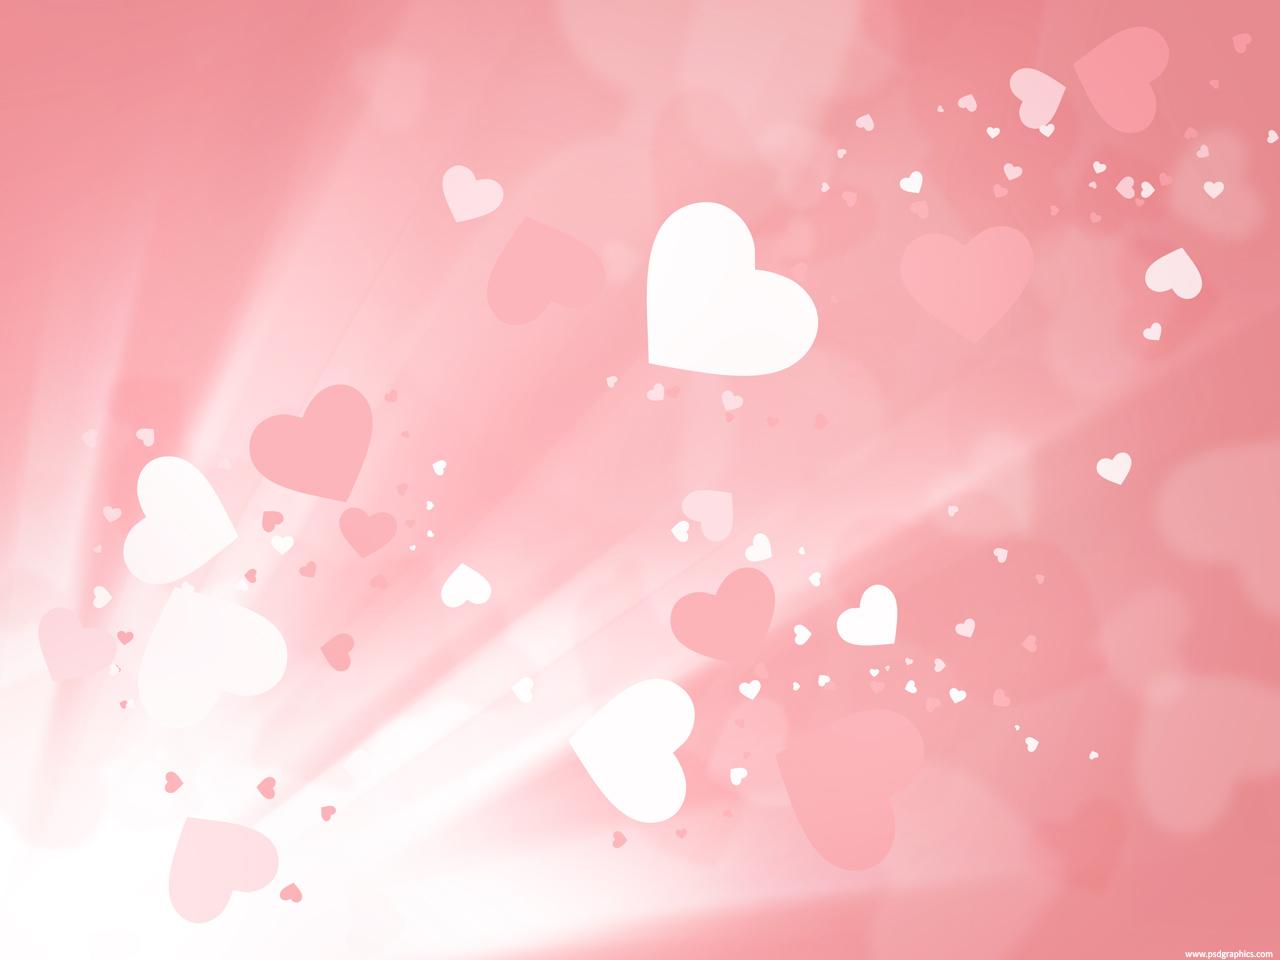 Valentines Day Background Pictures WallpaperSafari – Valentine Card Background